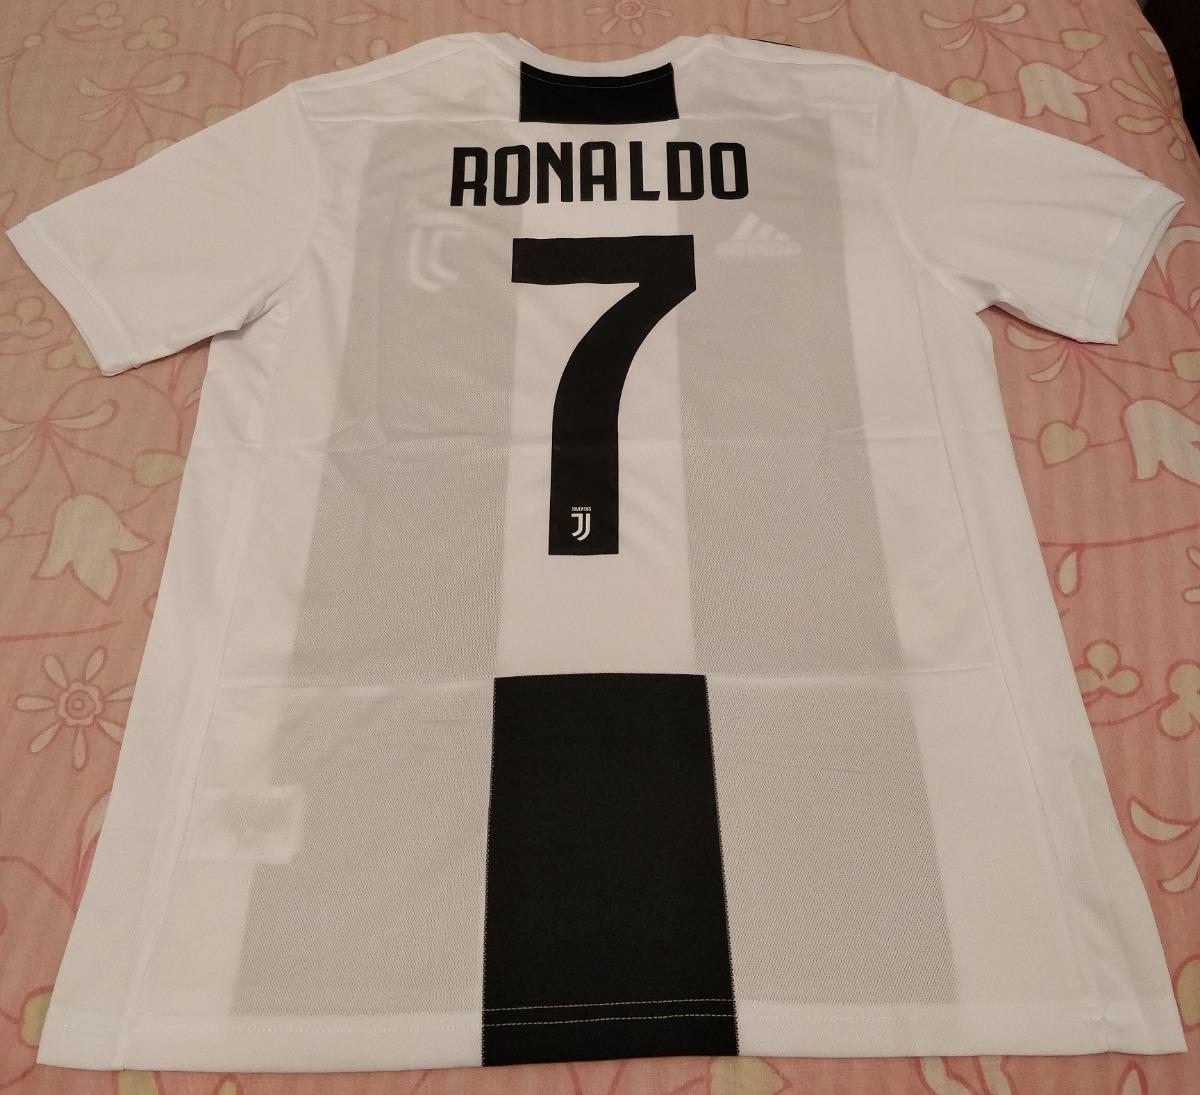 353ccdddc3ddd kit 10 camisas de futebol pronta entrega. Carregando zoom.